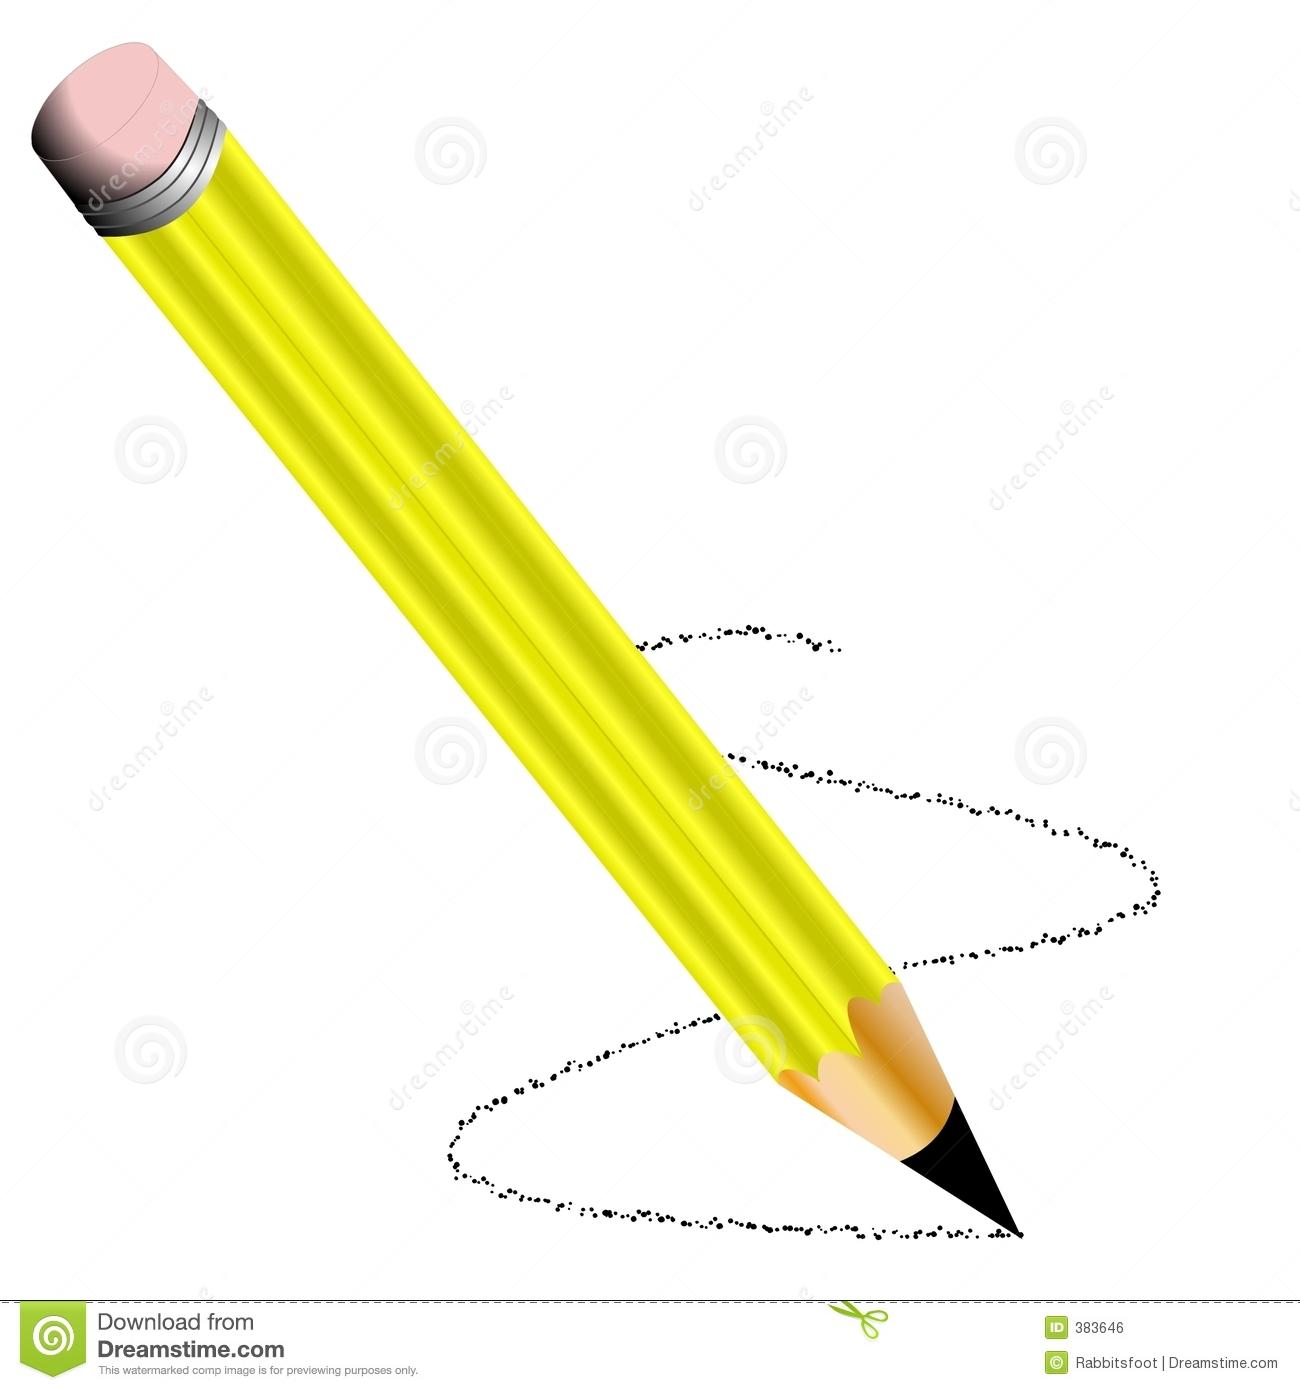 Pencil clipart sharp pencil Sharp Clipart Heraldic Clipart Yellow